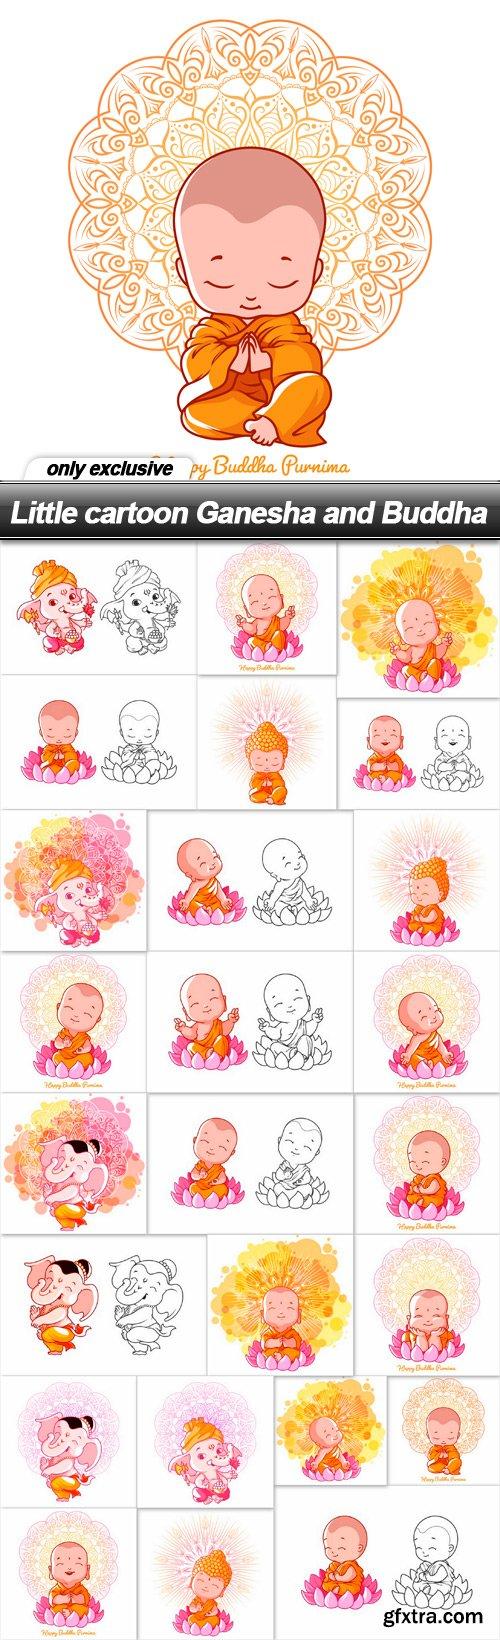 Little cartoon Ganesha and Buddha - 25 EPS